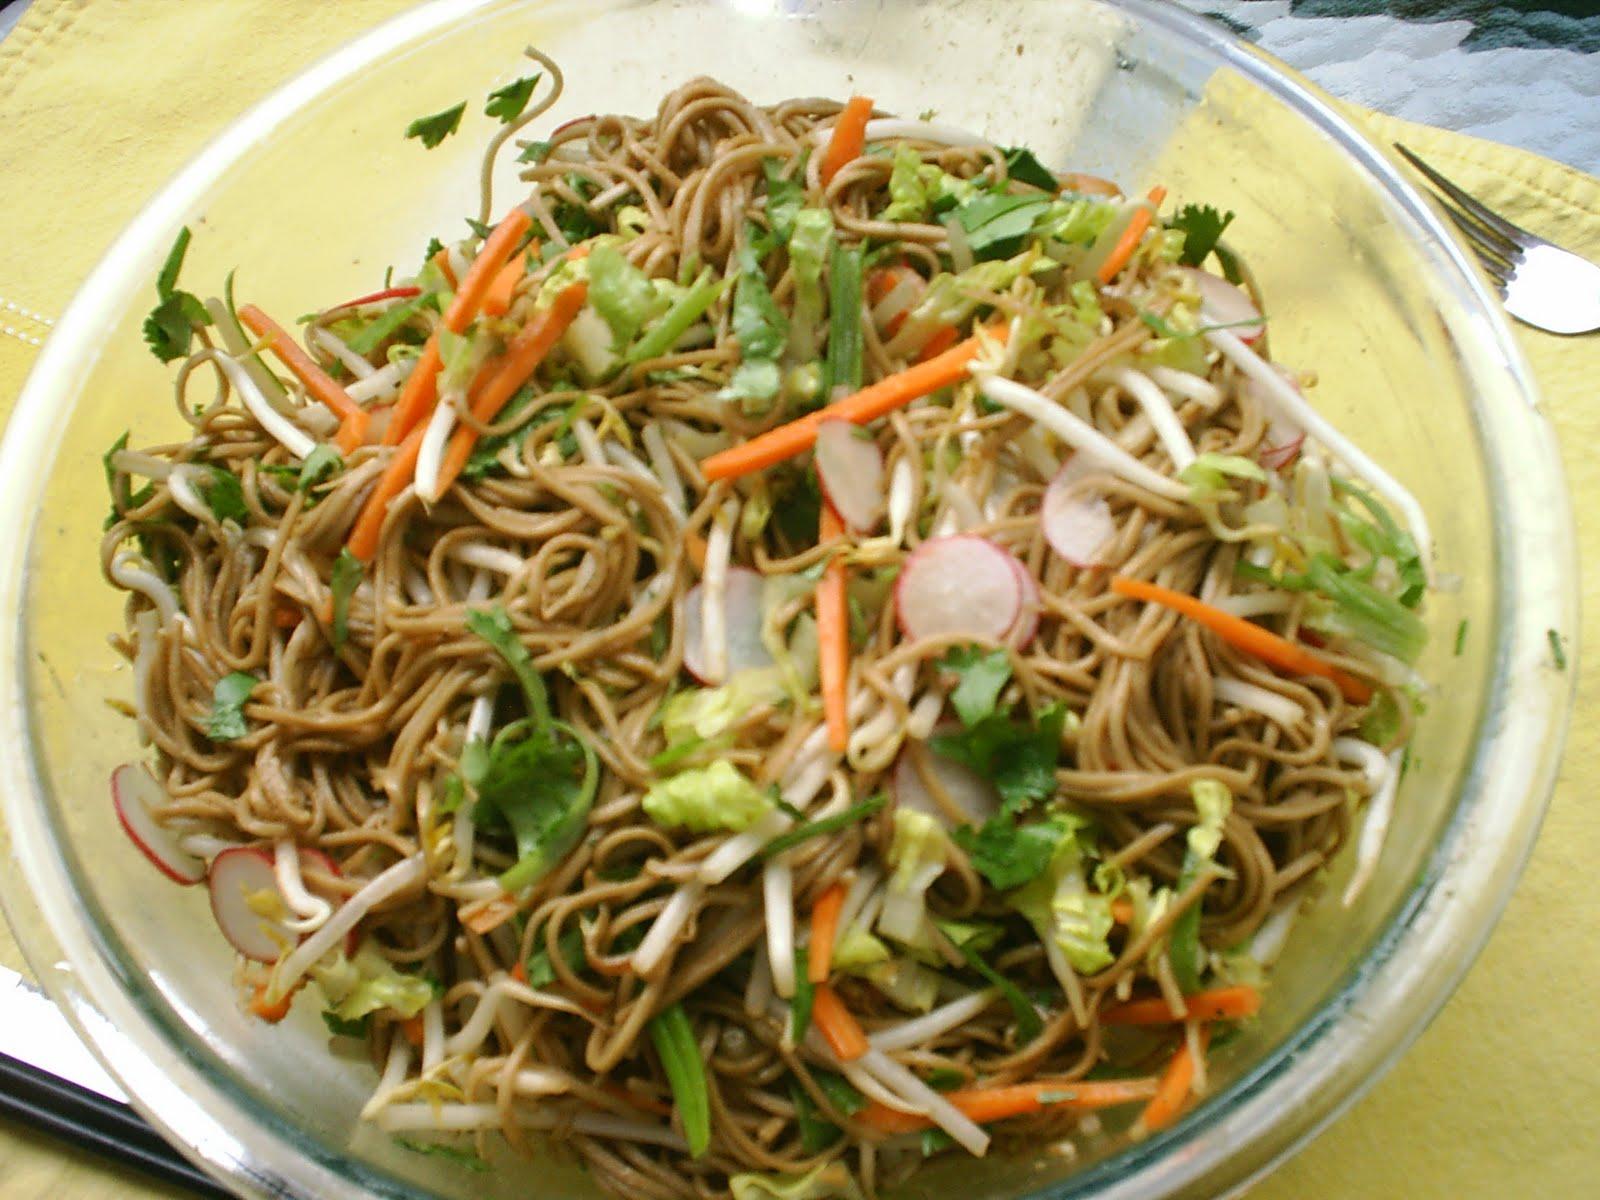 Moolicious Kitchen: Cold Soba Noodle Salad